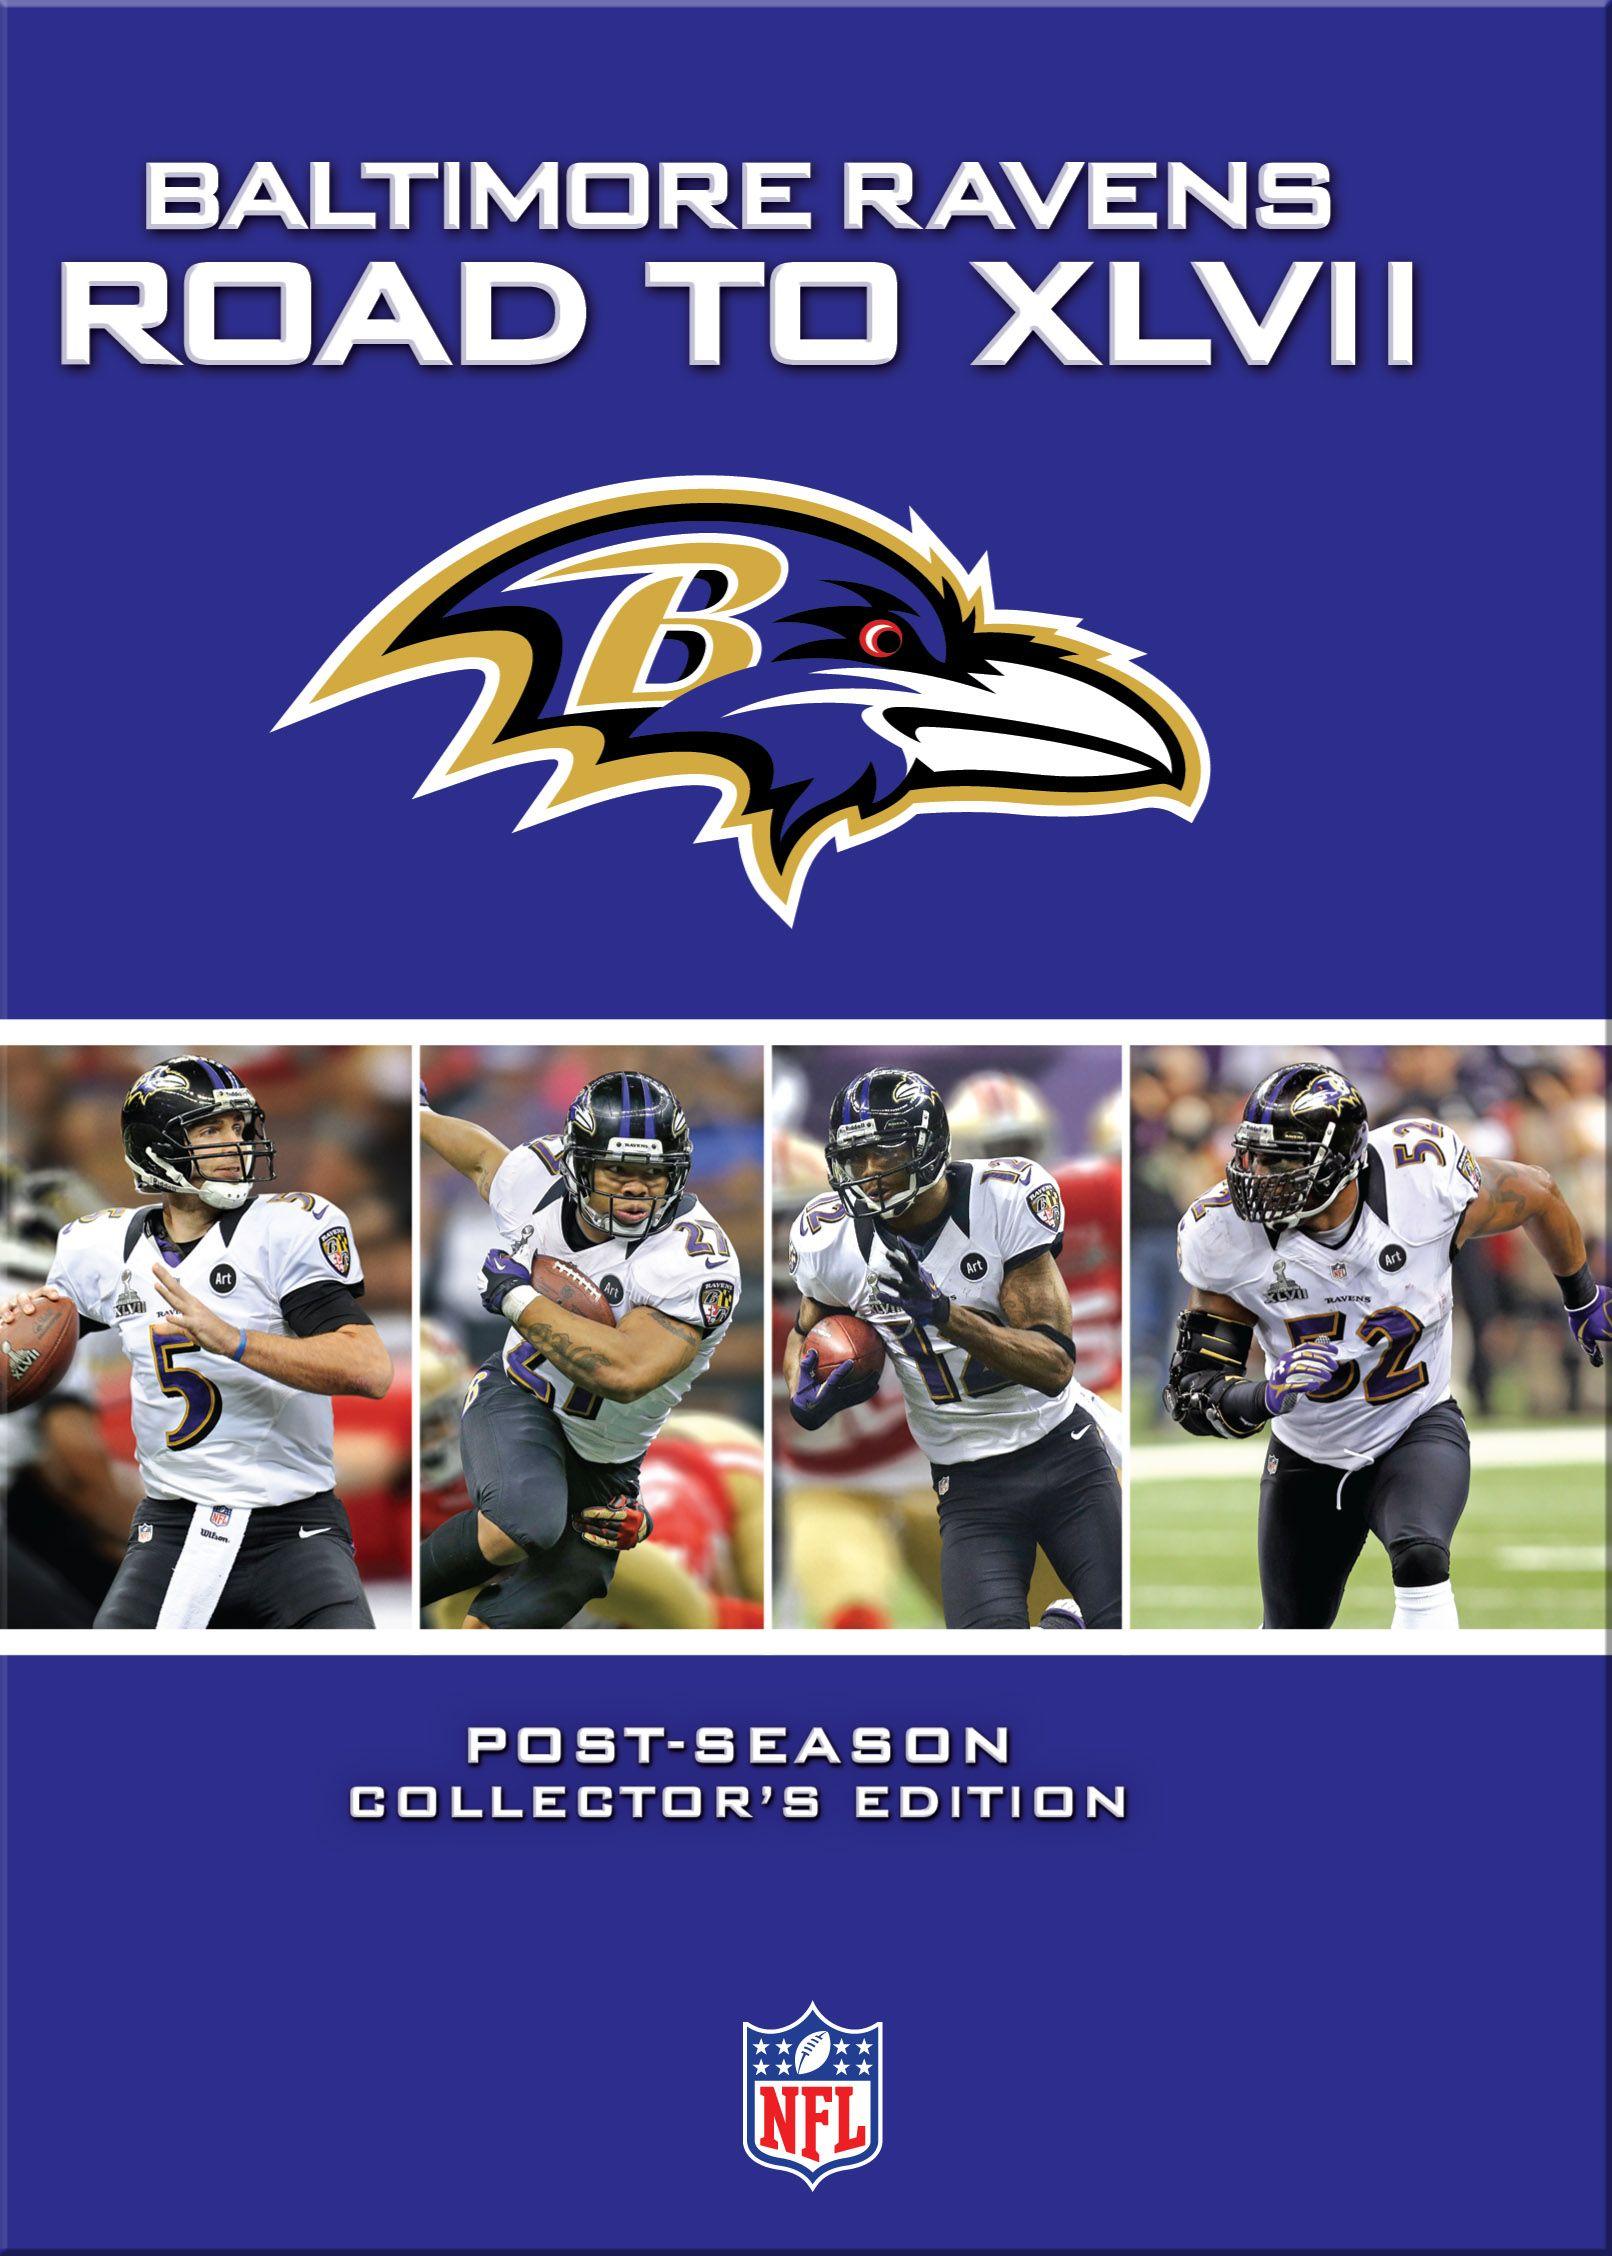 NFL: Baltimore Ravens - Road to XLVII